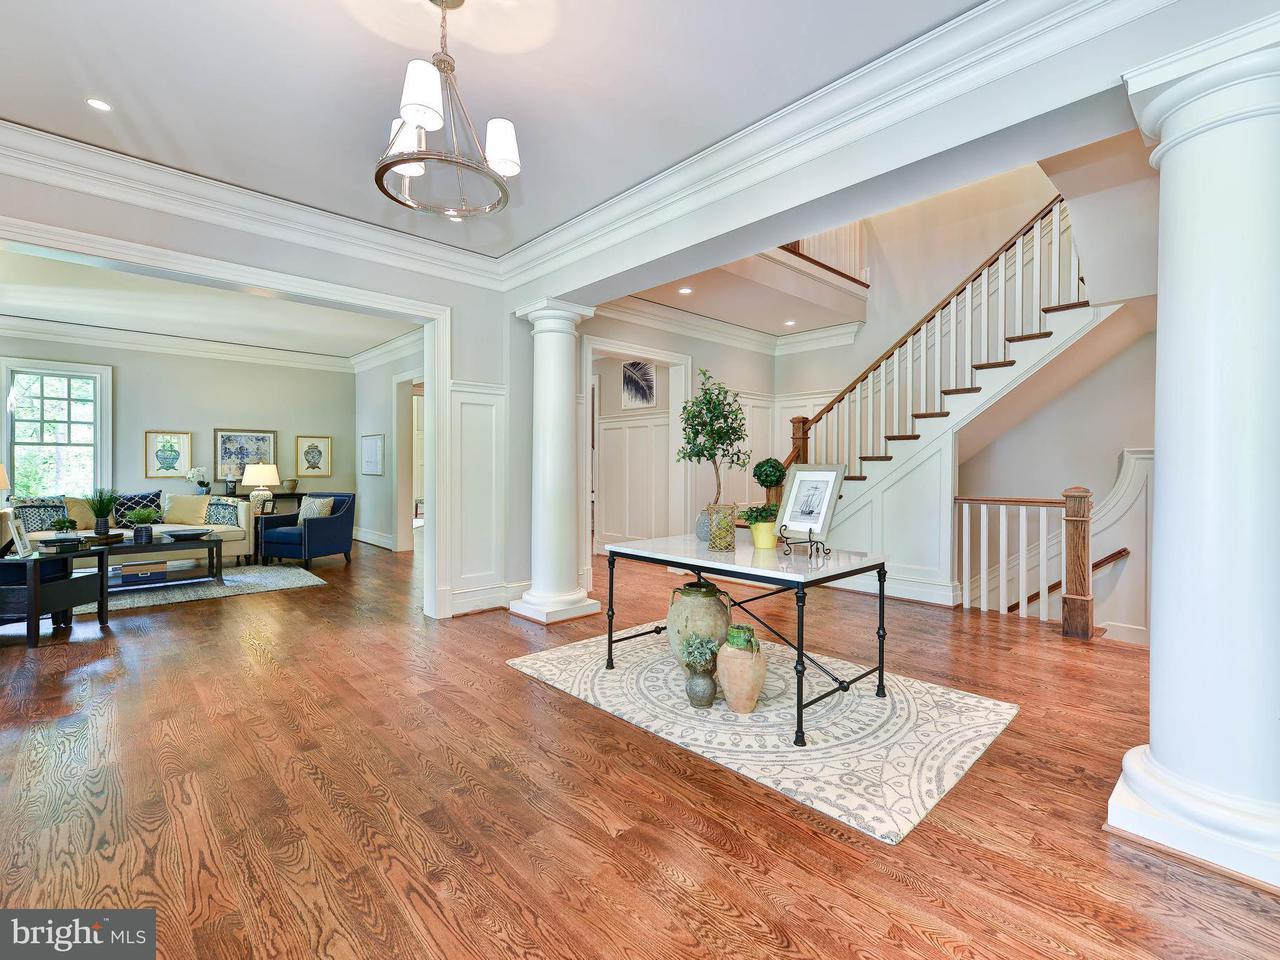 Additional photo for property listing at 9430 Cornwell Farm Drive 9430 Cornwell Farm Drive Great Falls, Virginia 22066 United States